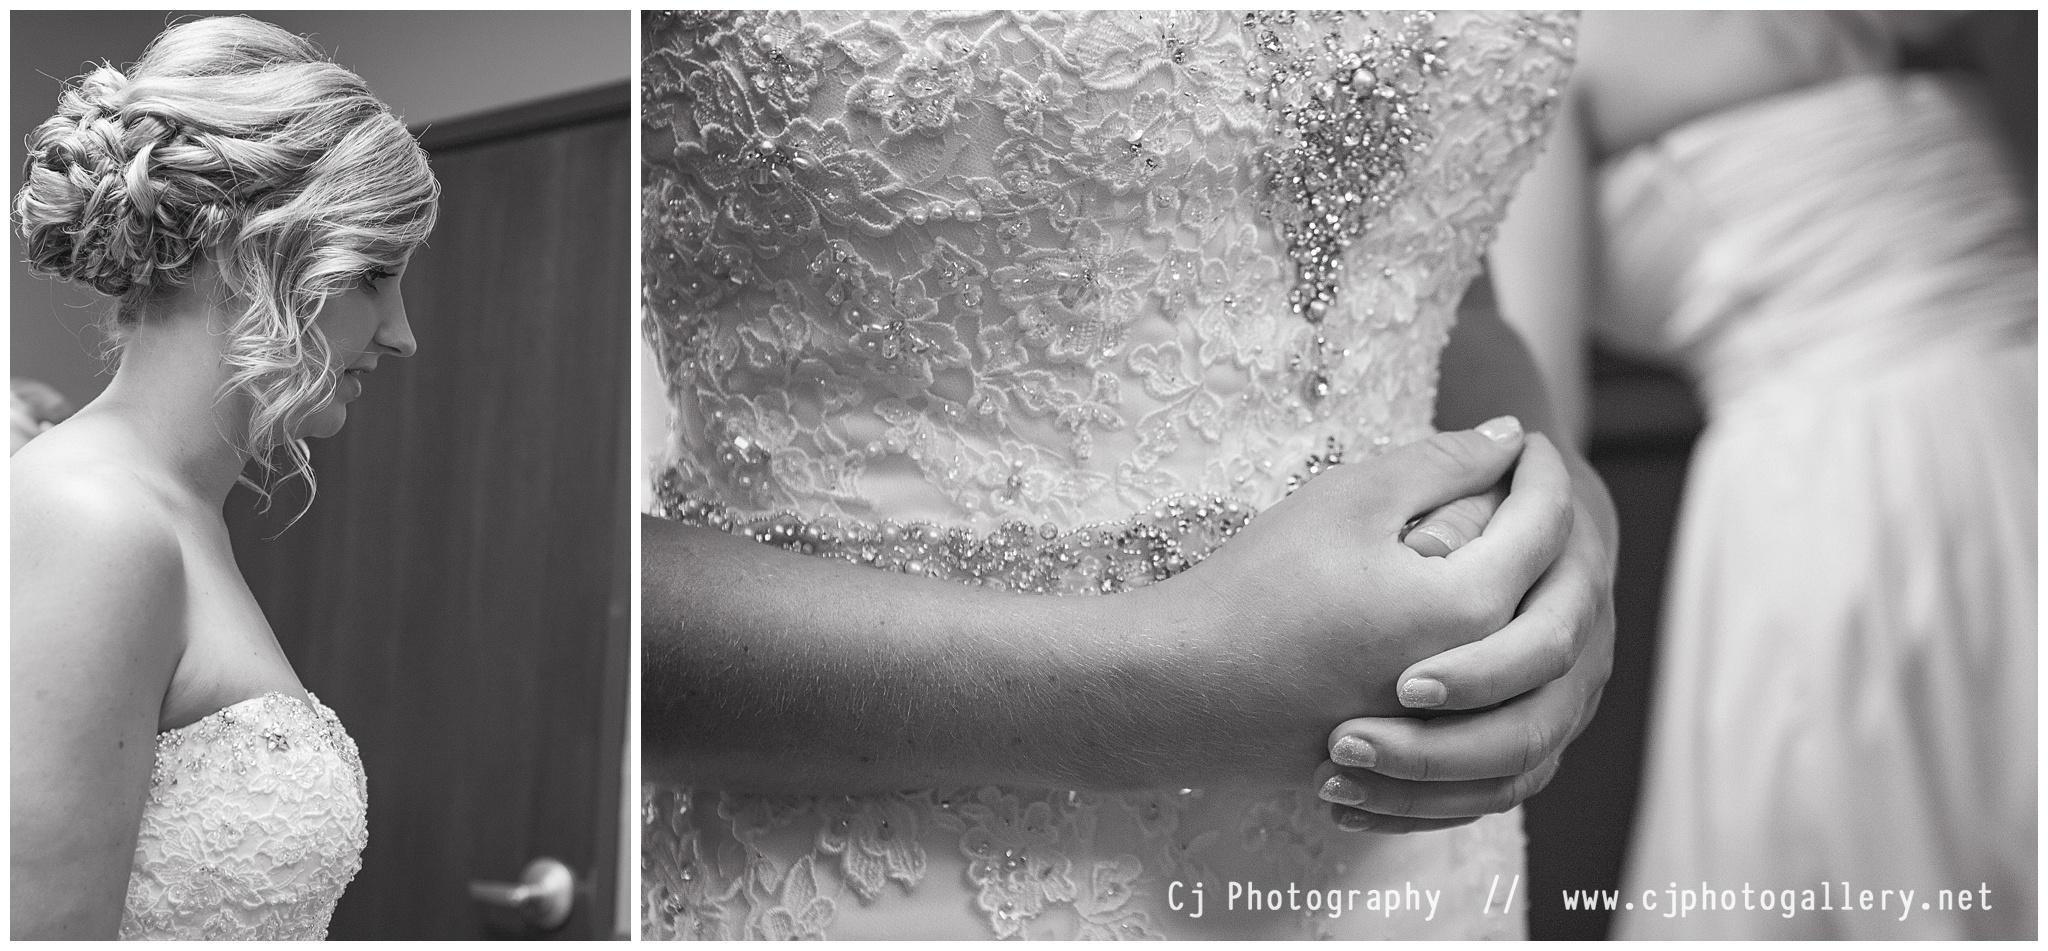 Cj Photography   Wisconsin Wedding Photography